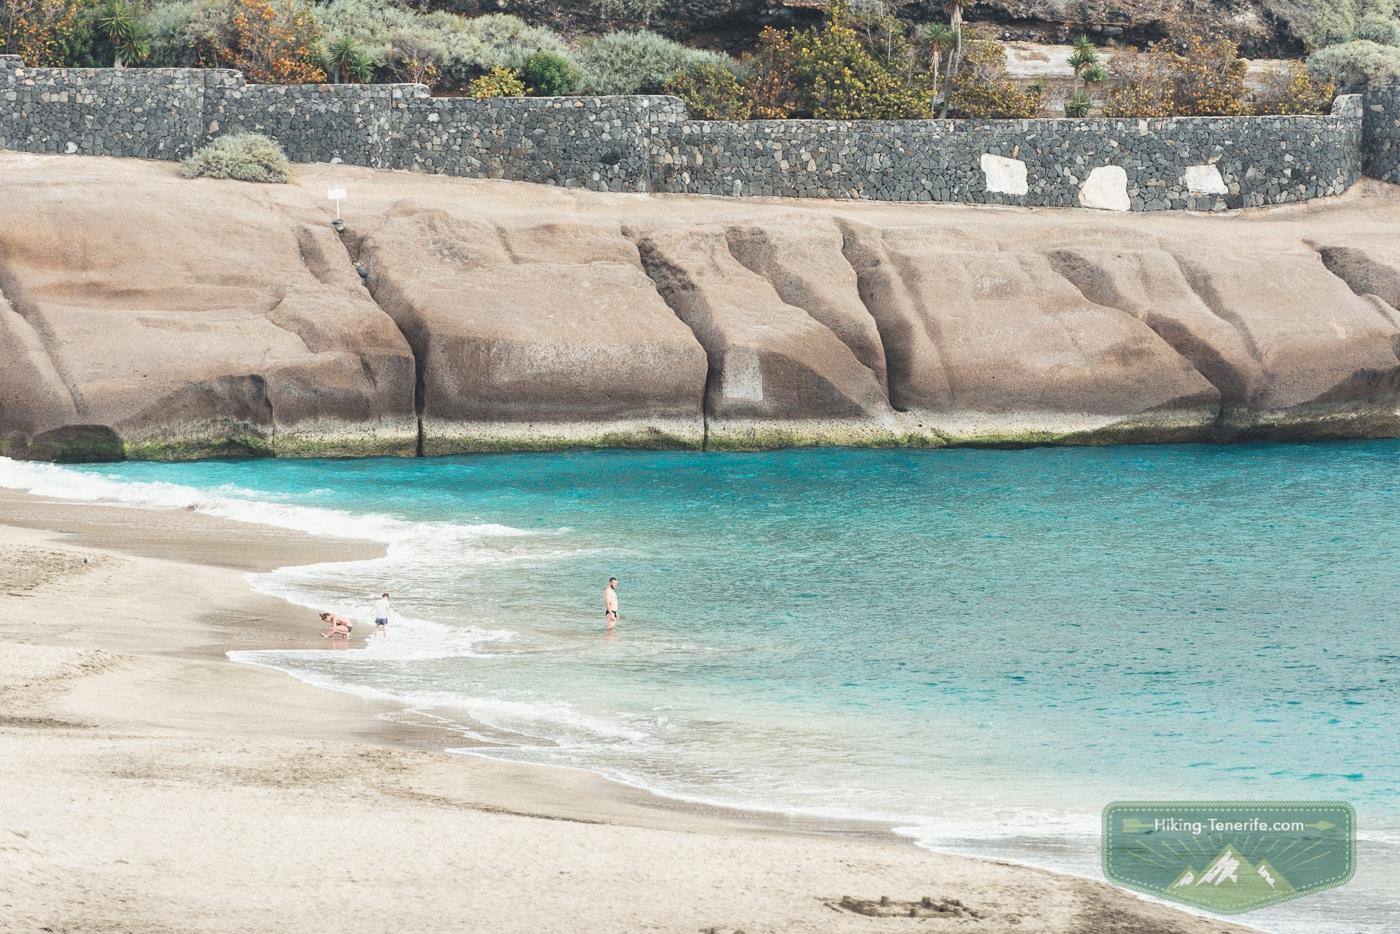 пляж эль дюке тенерифе